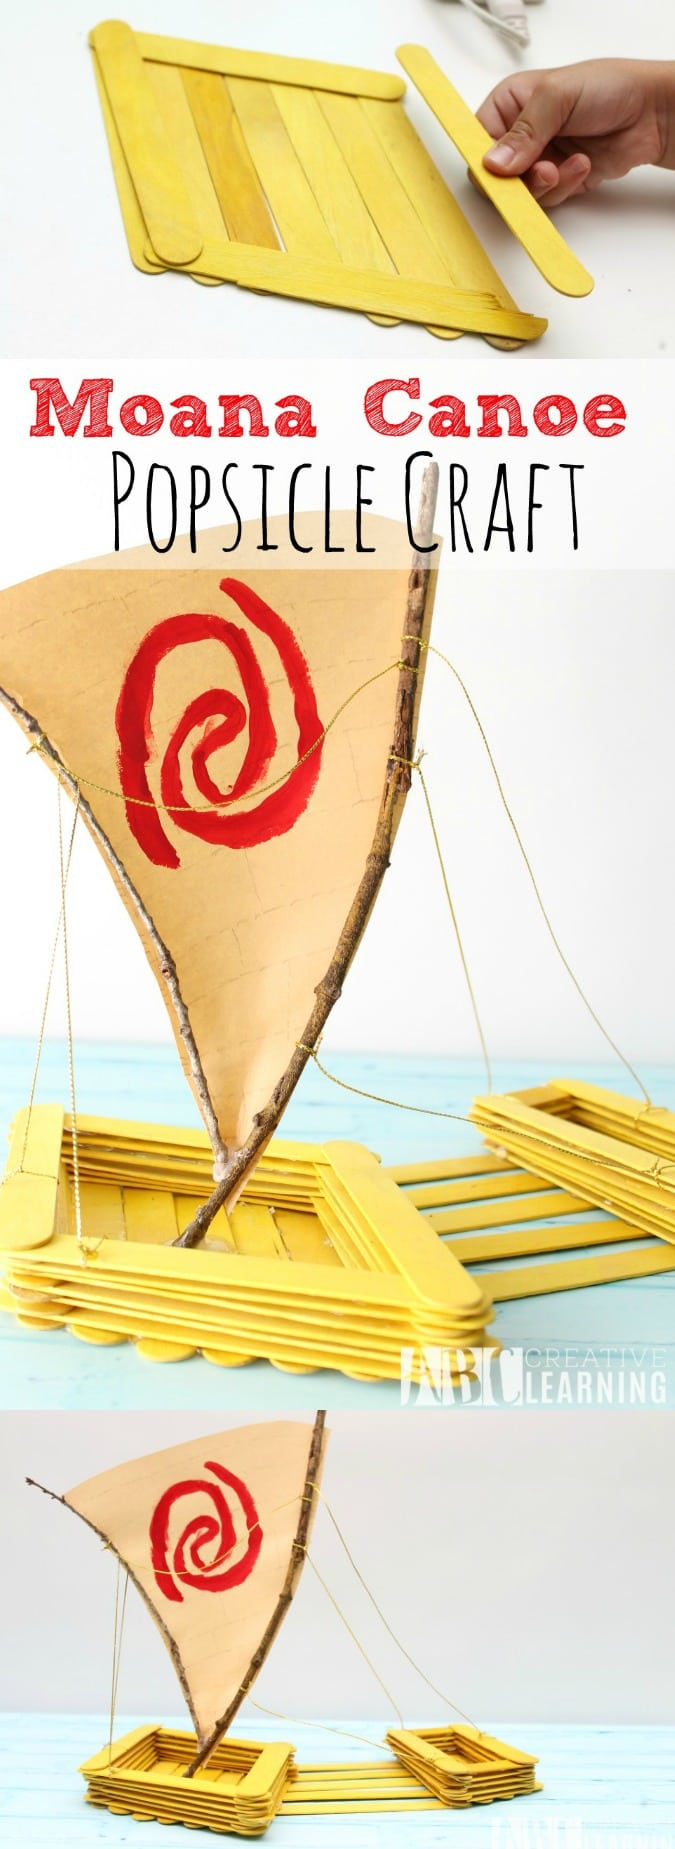 Moana Canoe Popsicle Craft